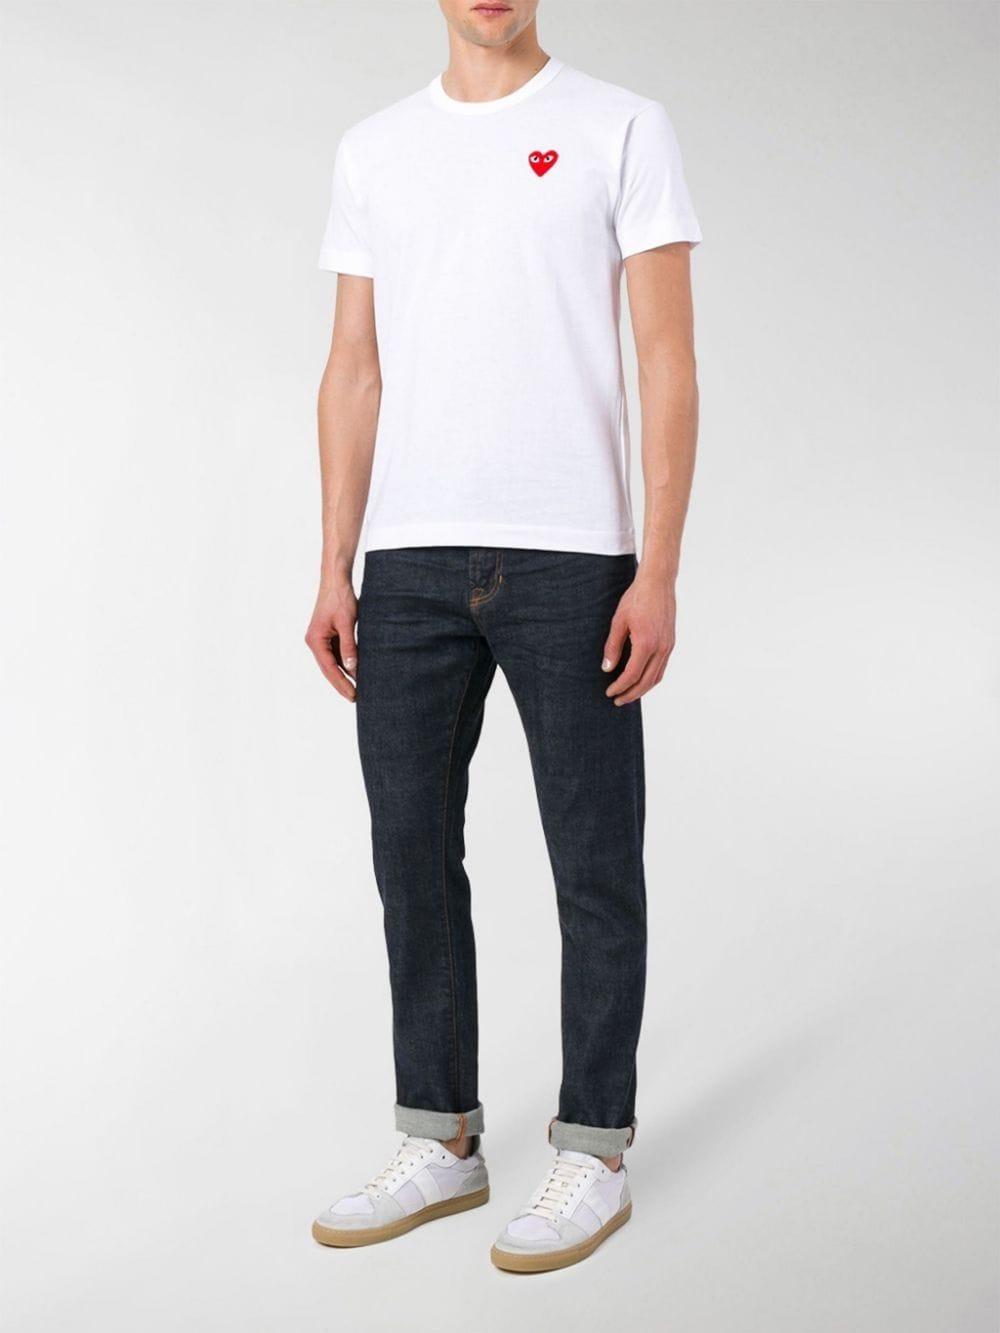 t-shirt play uomo bianca in cotone COMME DES GARÇONS PLAY | T-shirt | P1T1082